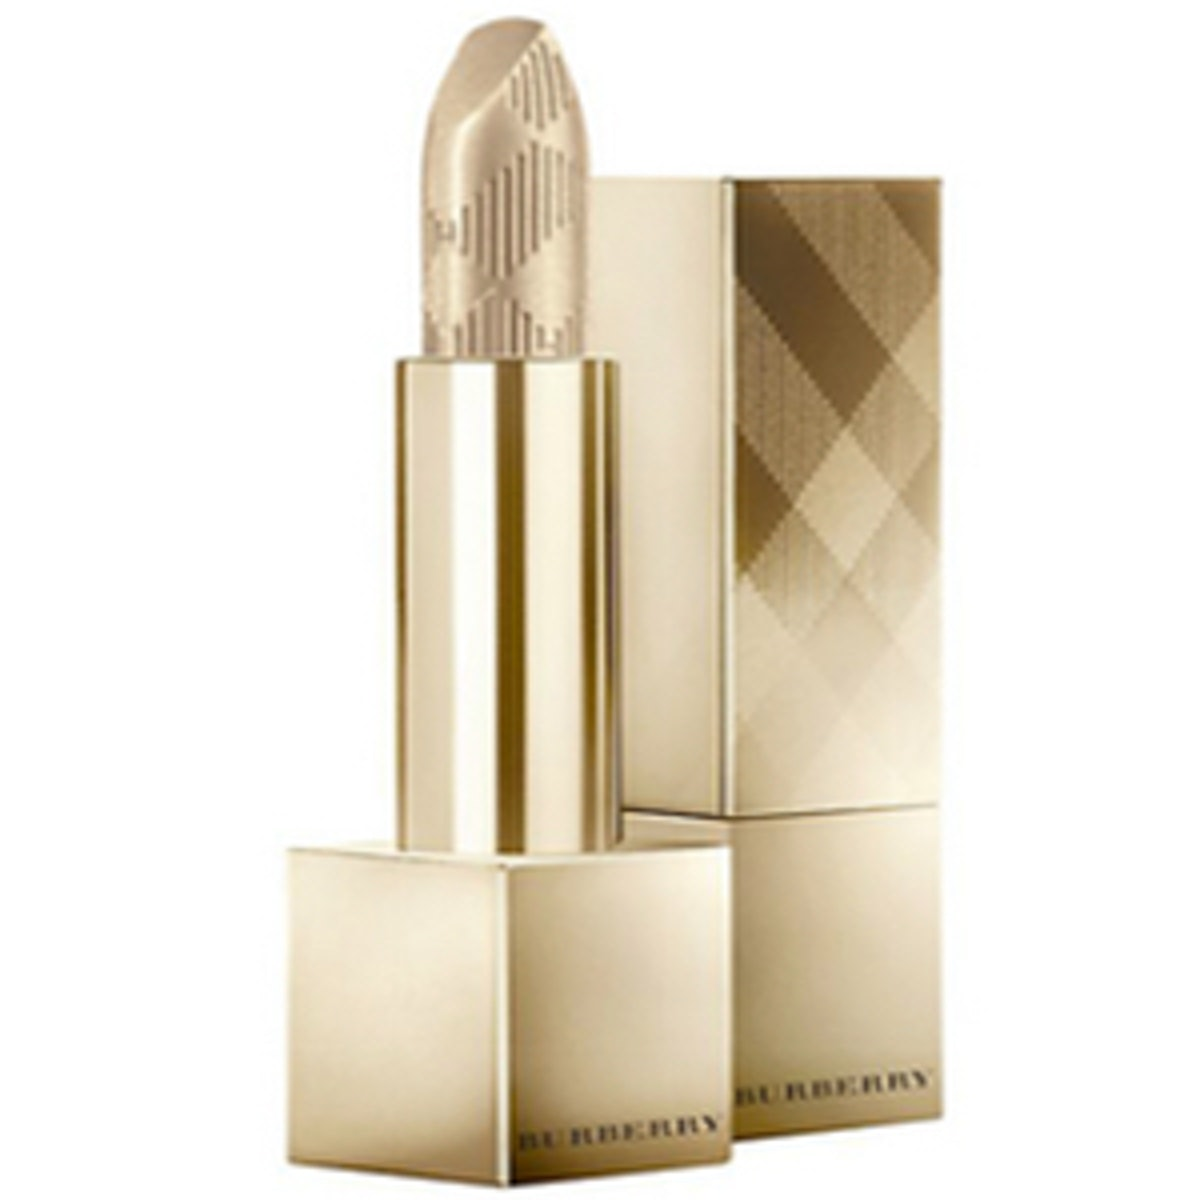 Kisses Lipstick in Festival Gold